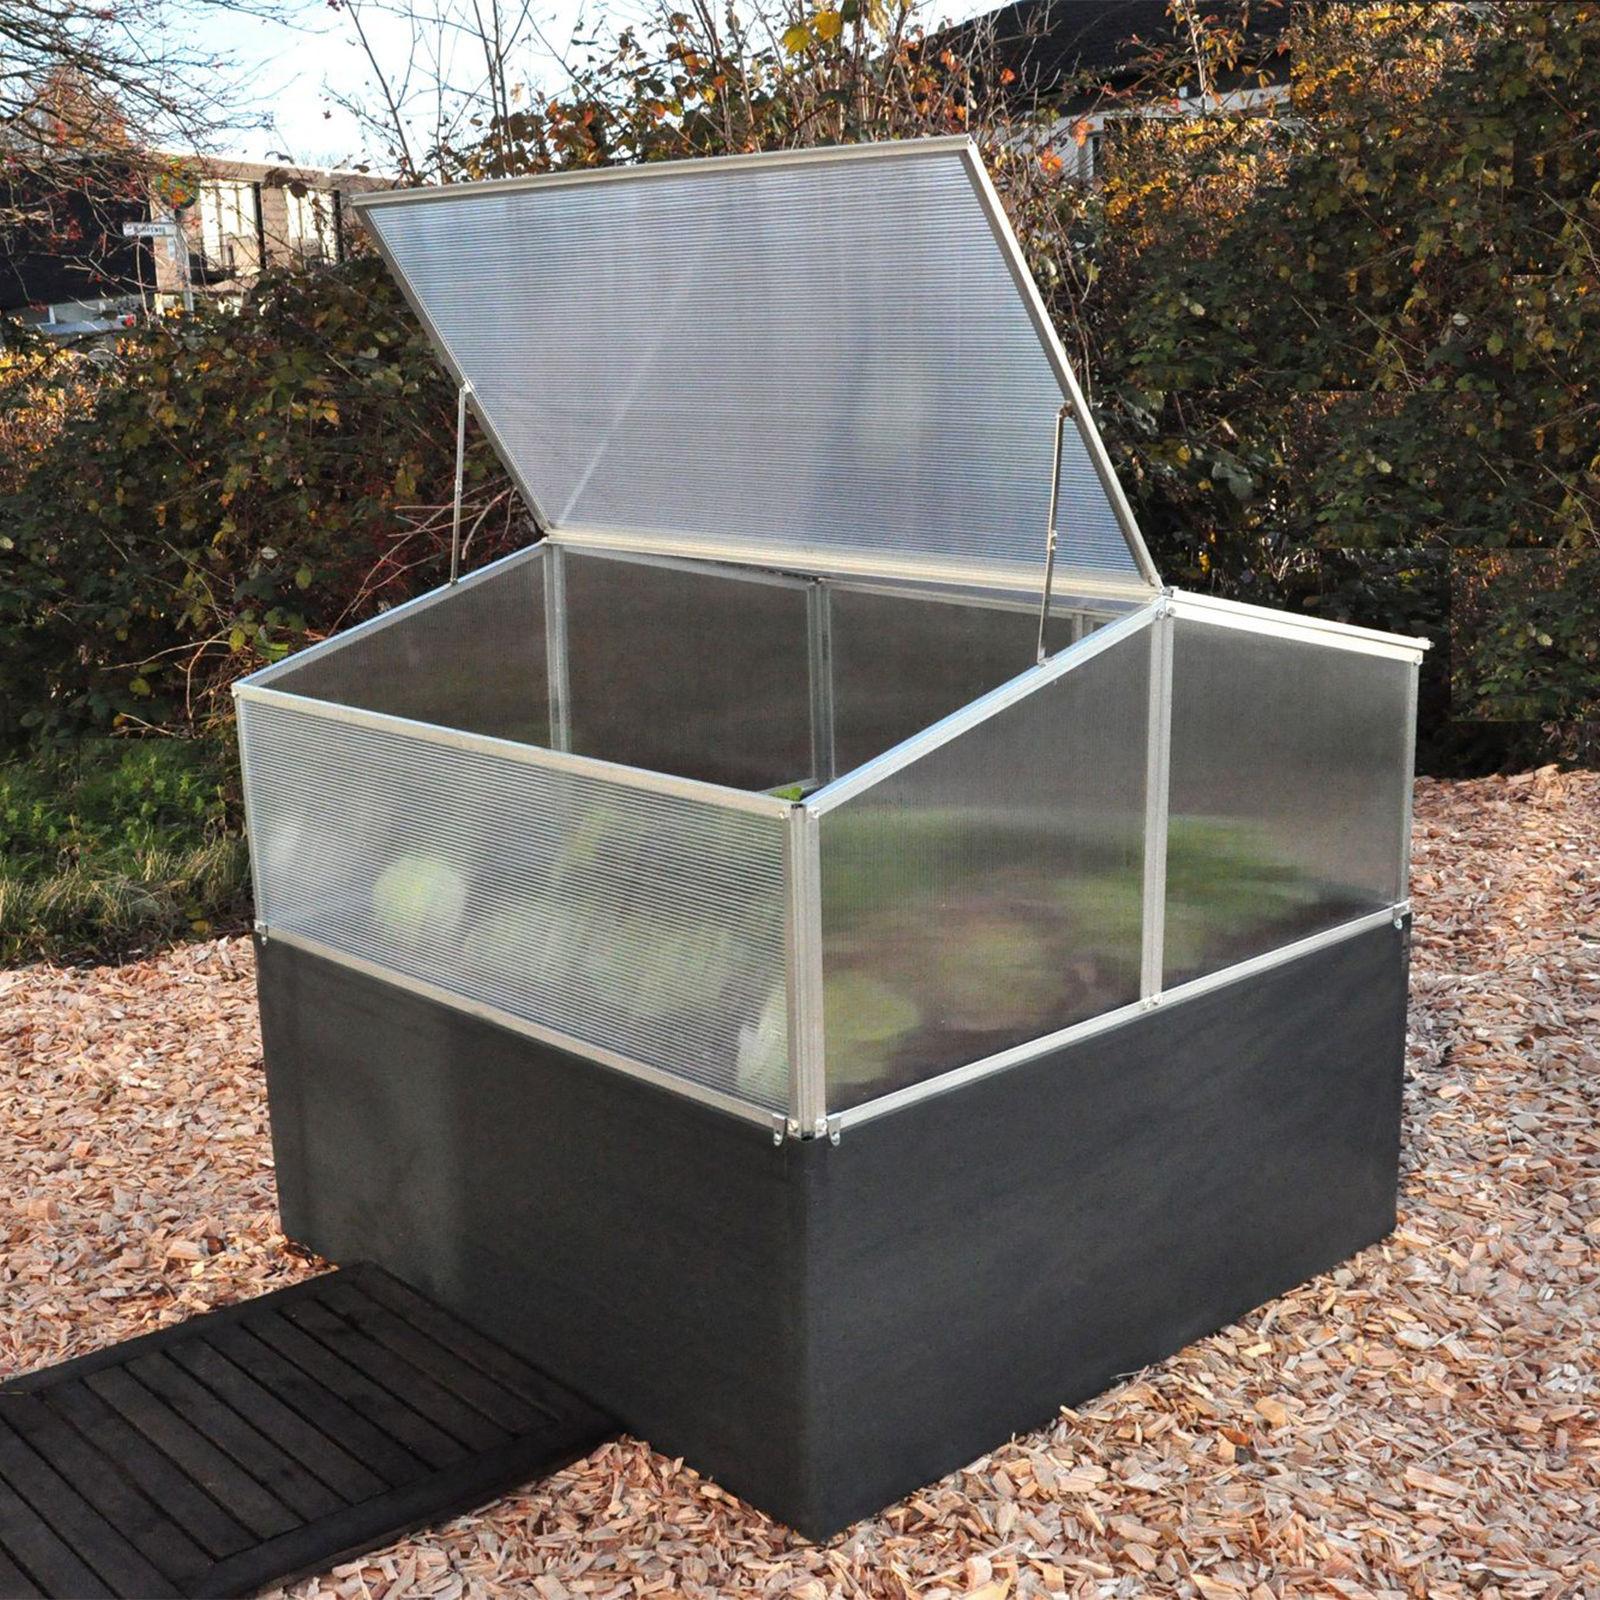 Hori Growcamp Hochbeet Pflanzenbeet Gemusebeet Pflanzkasten Versch